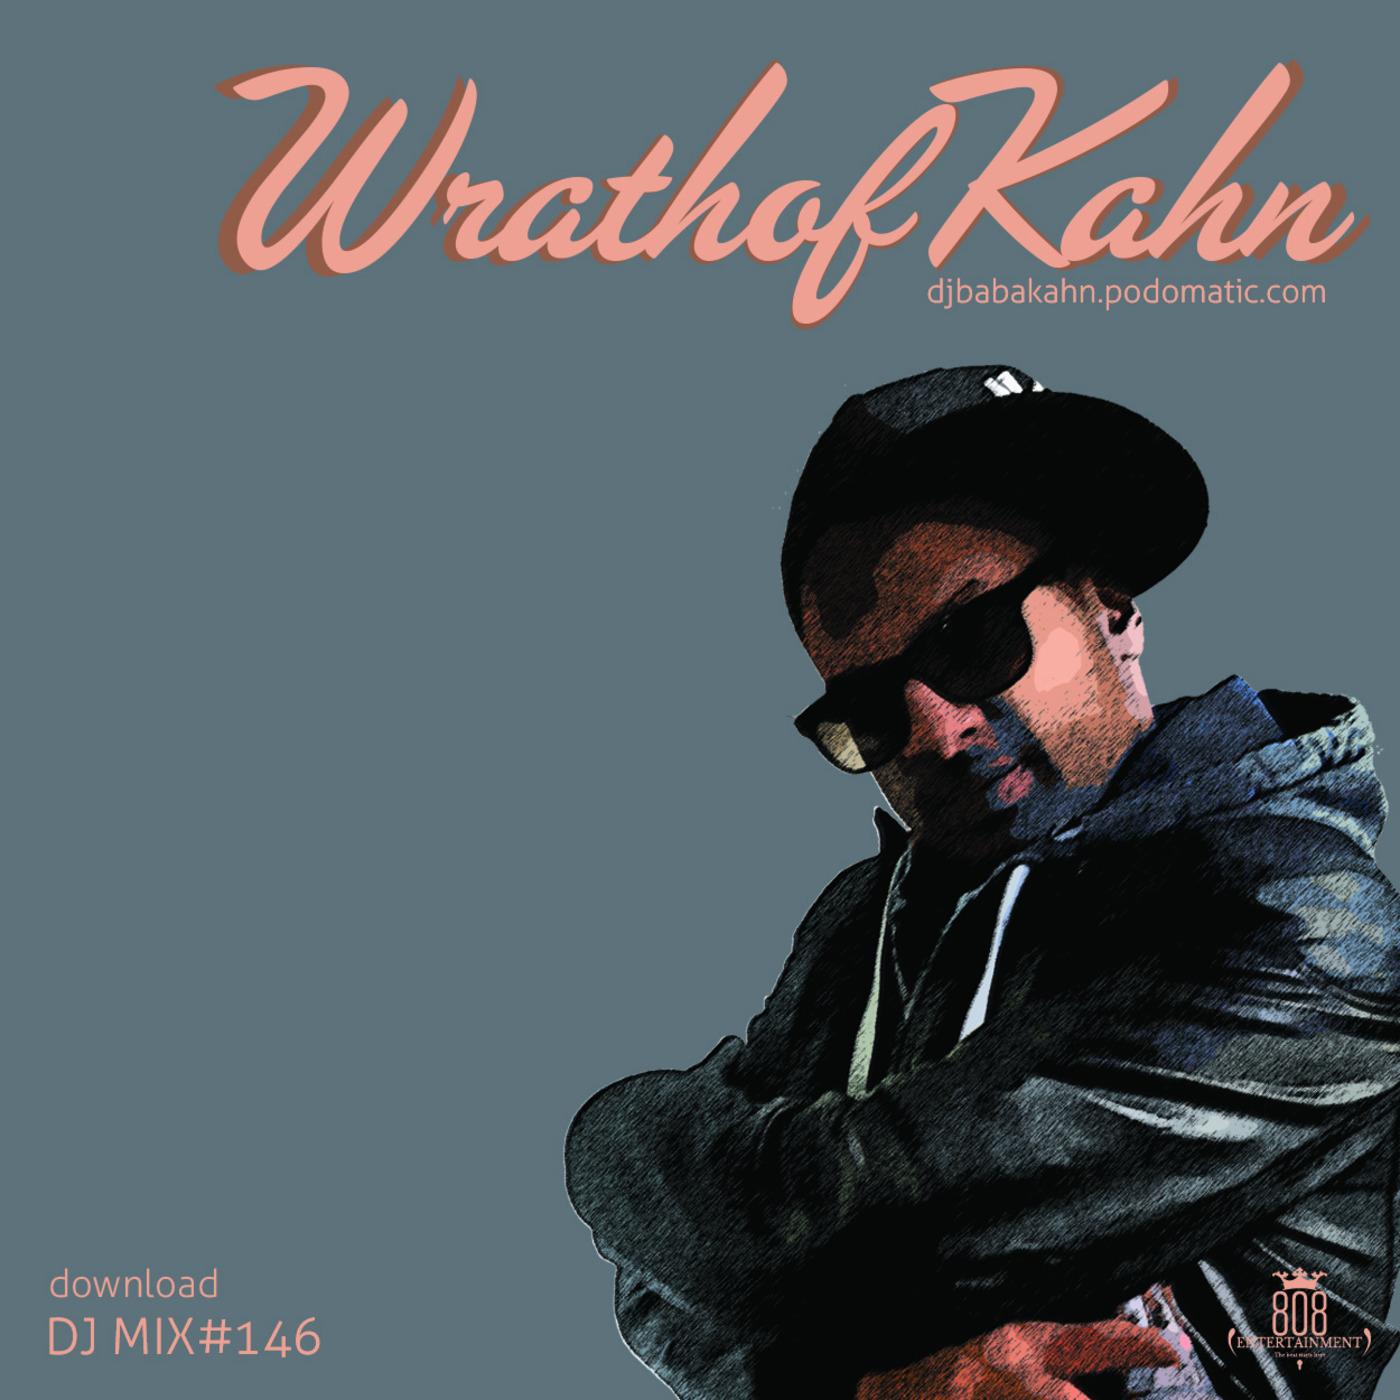 DJ BABA KAHN PODCAST | Podbay